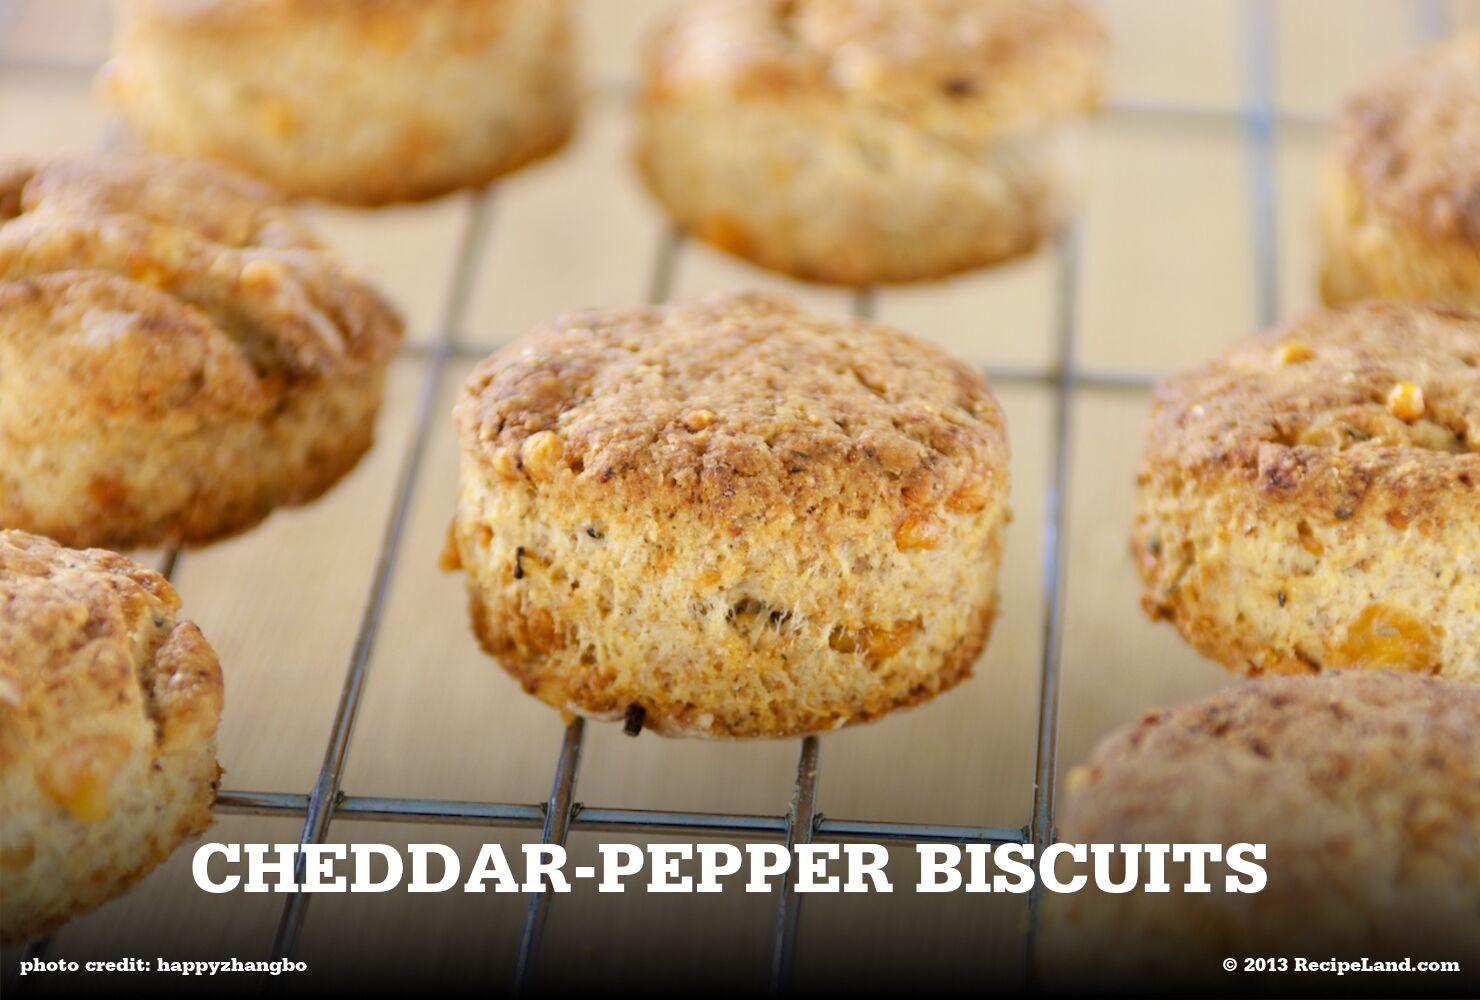 Cheddar-Pepper Biscuits